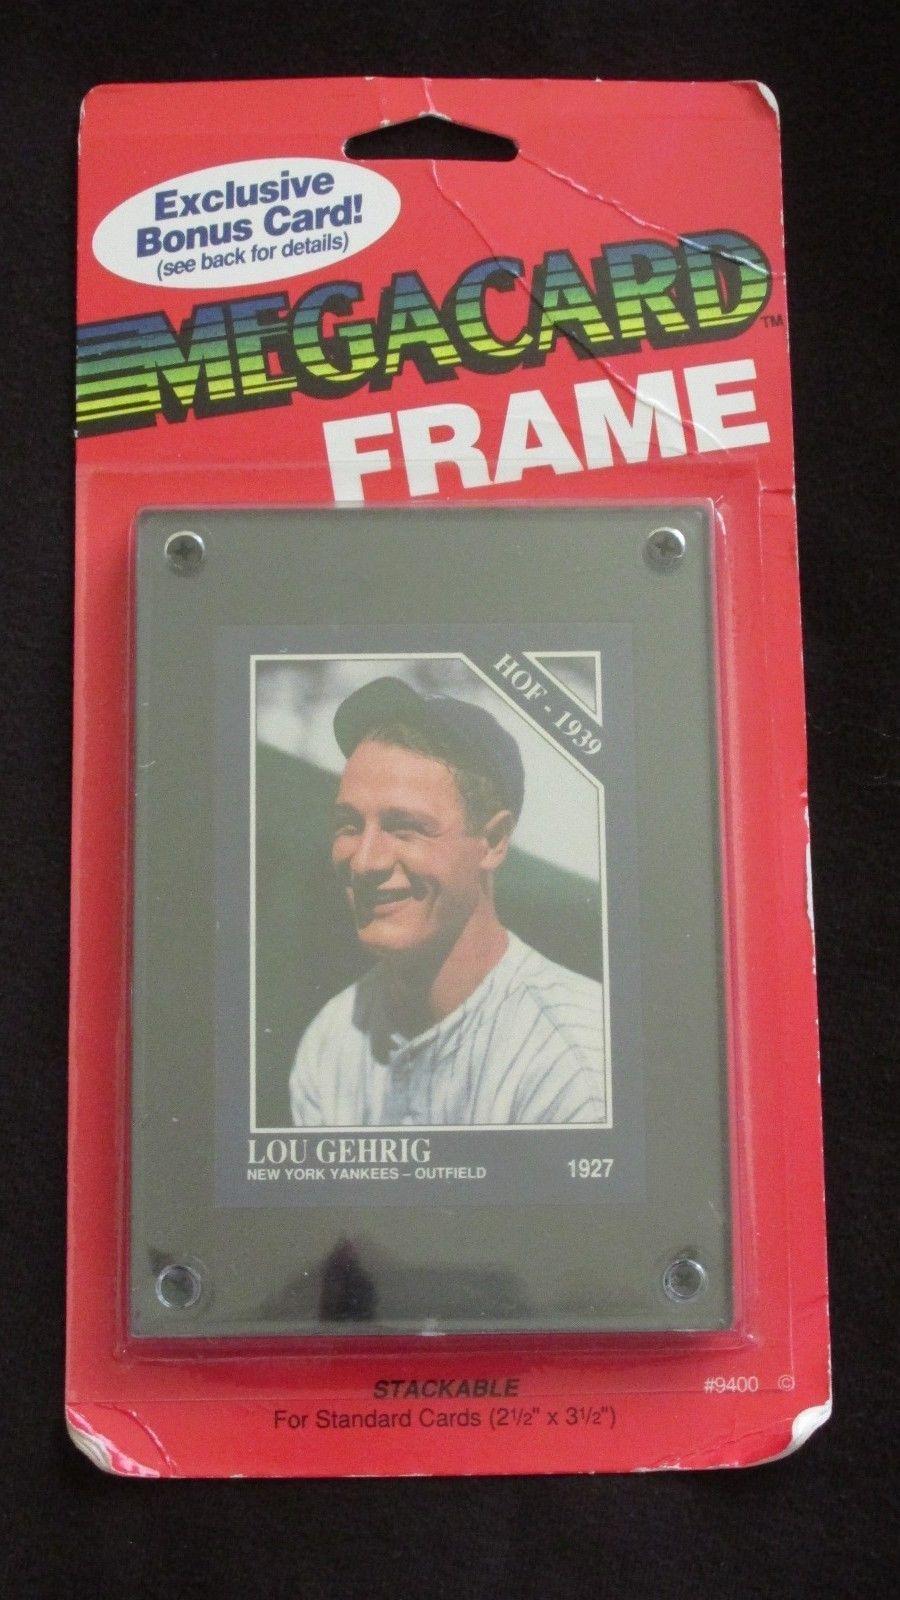 Lou Gehrig New York Yankees, The Sporting News 1992 Conlon